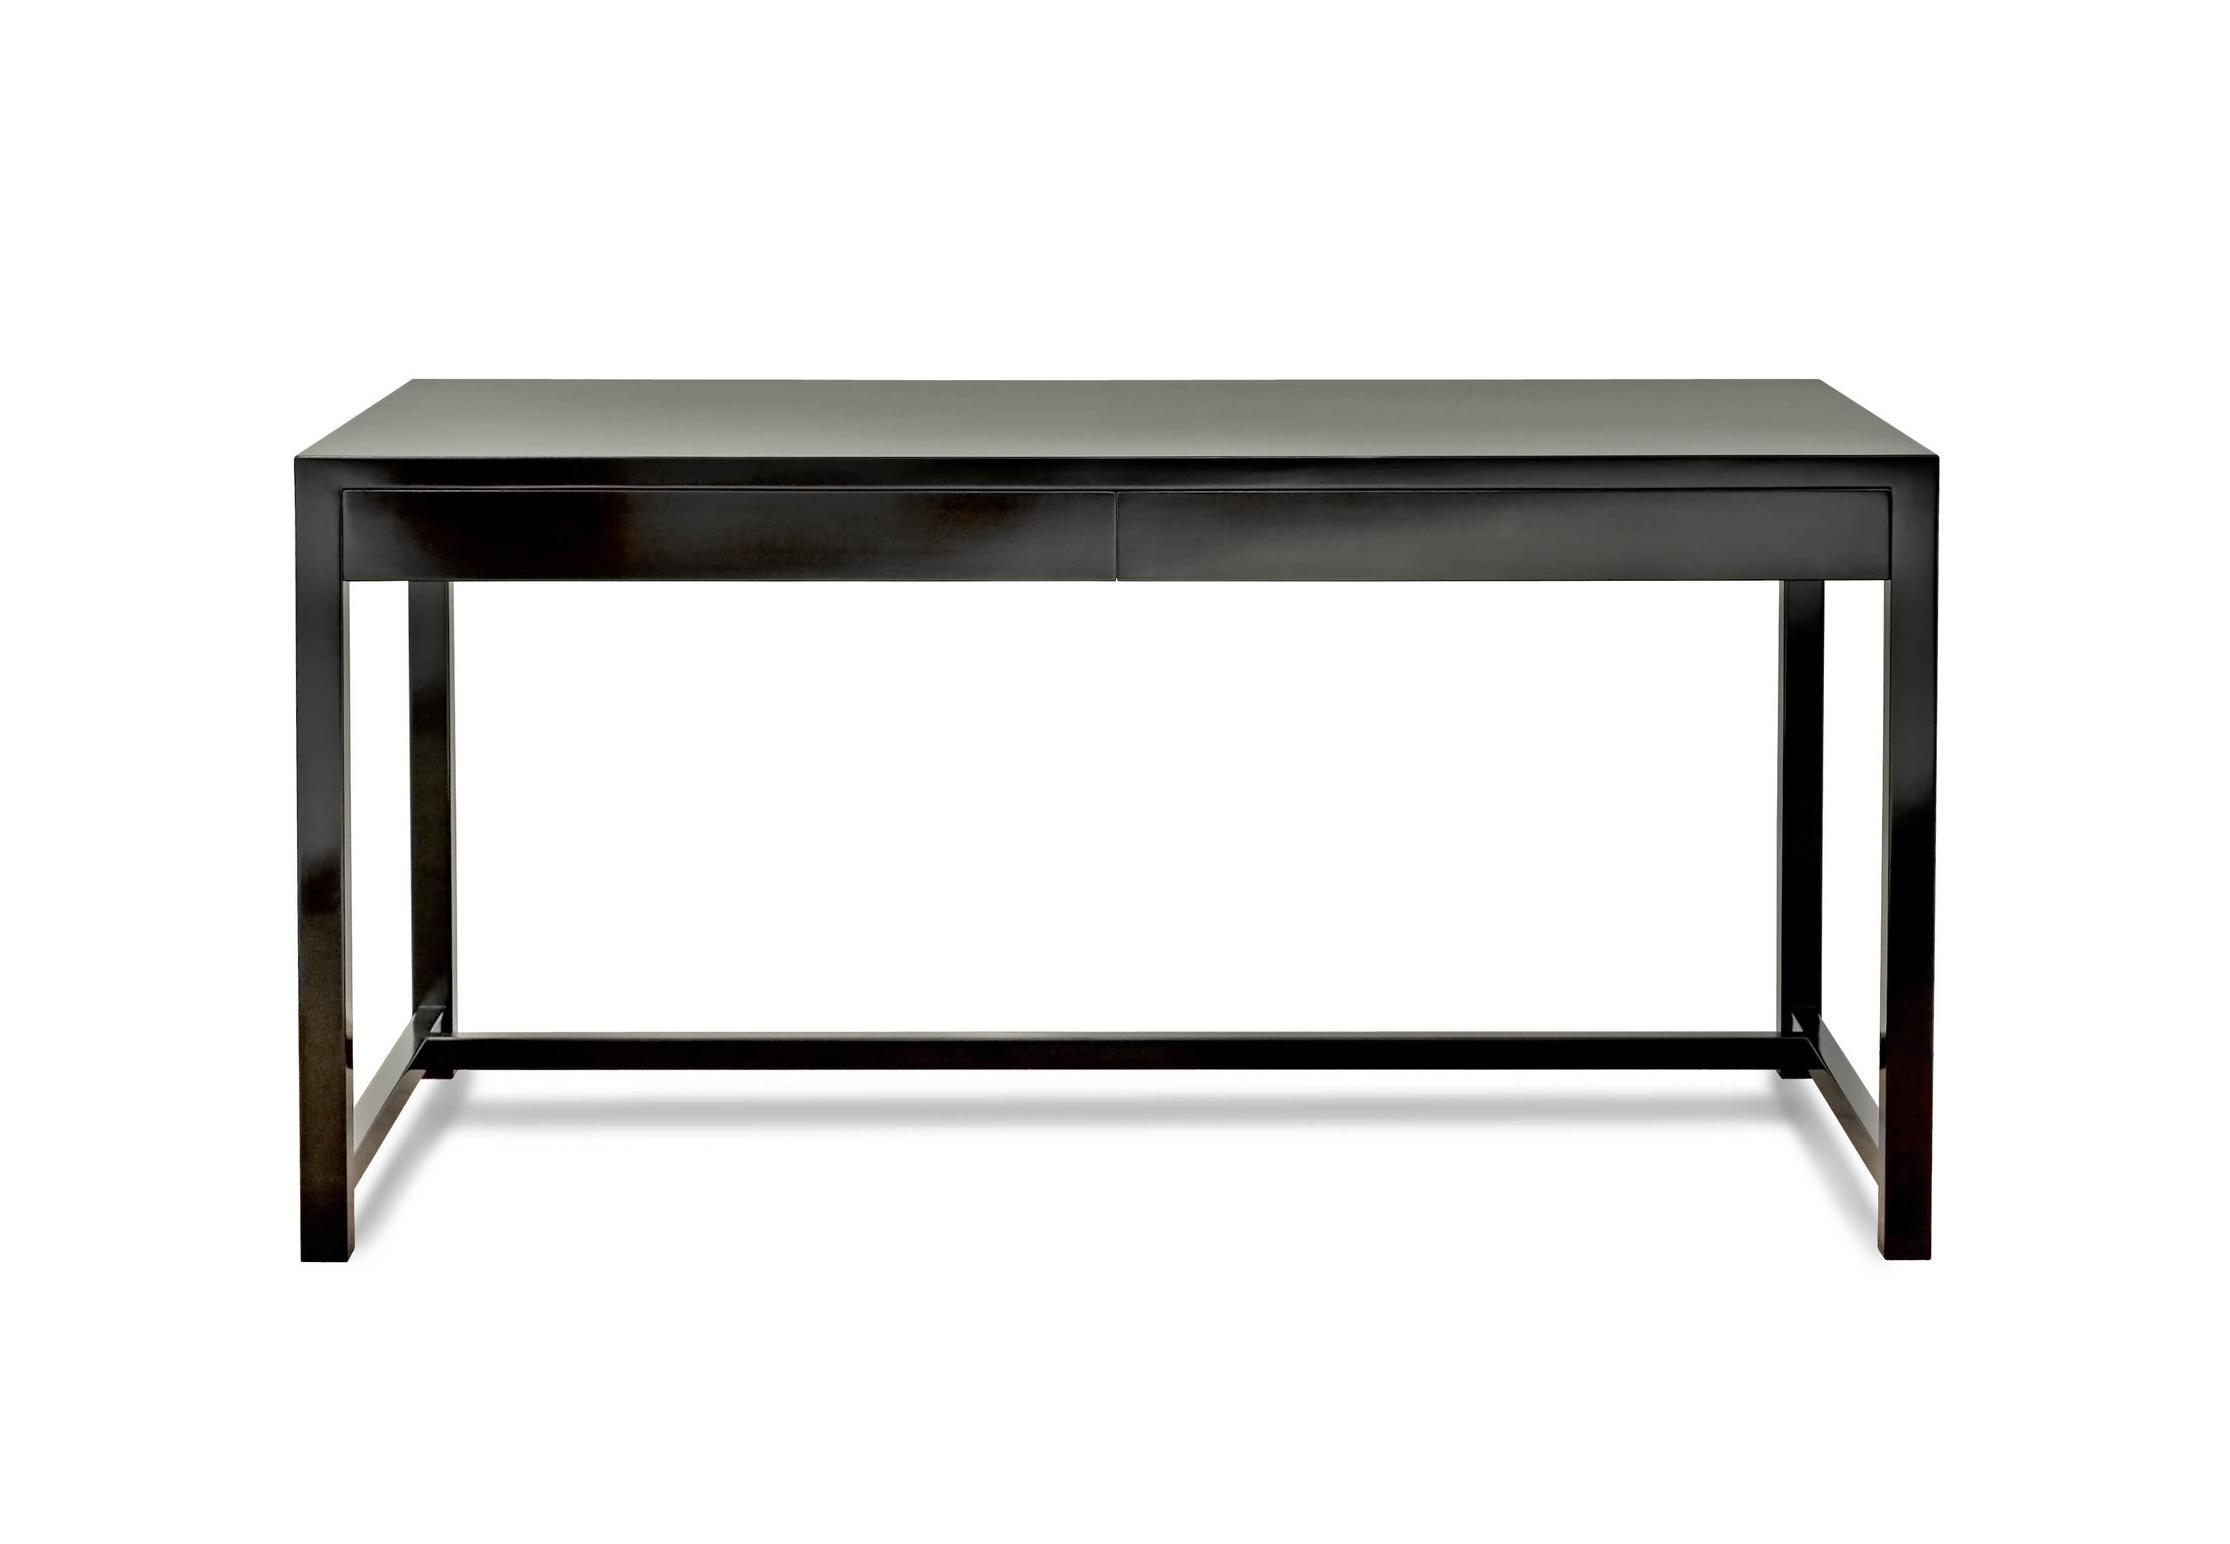 .modern furniture : desk..摩登家具 : 写字台....